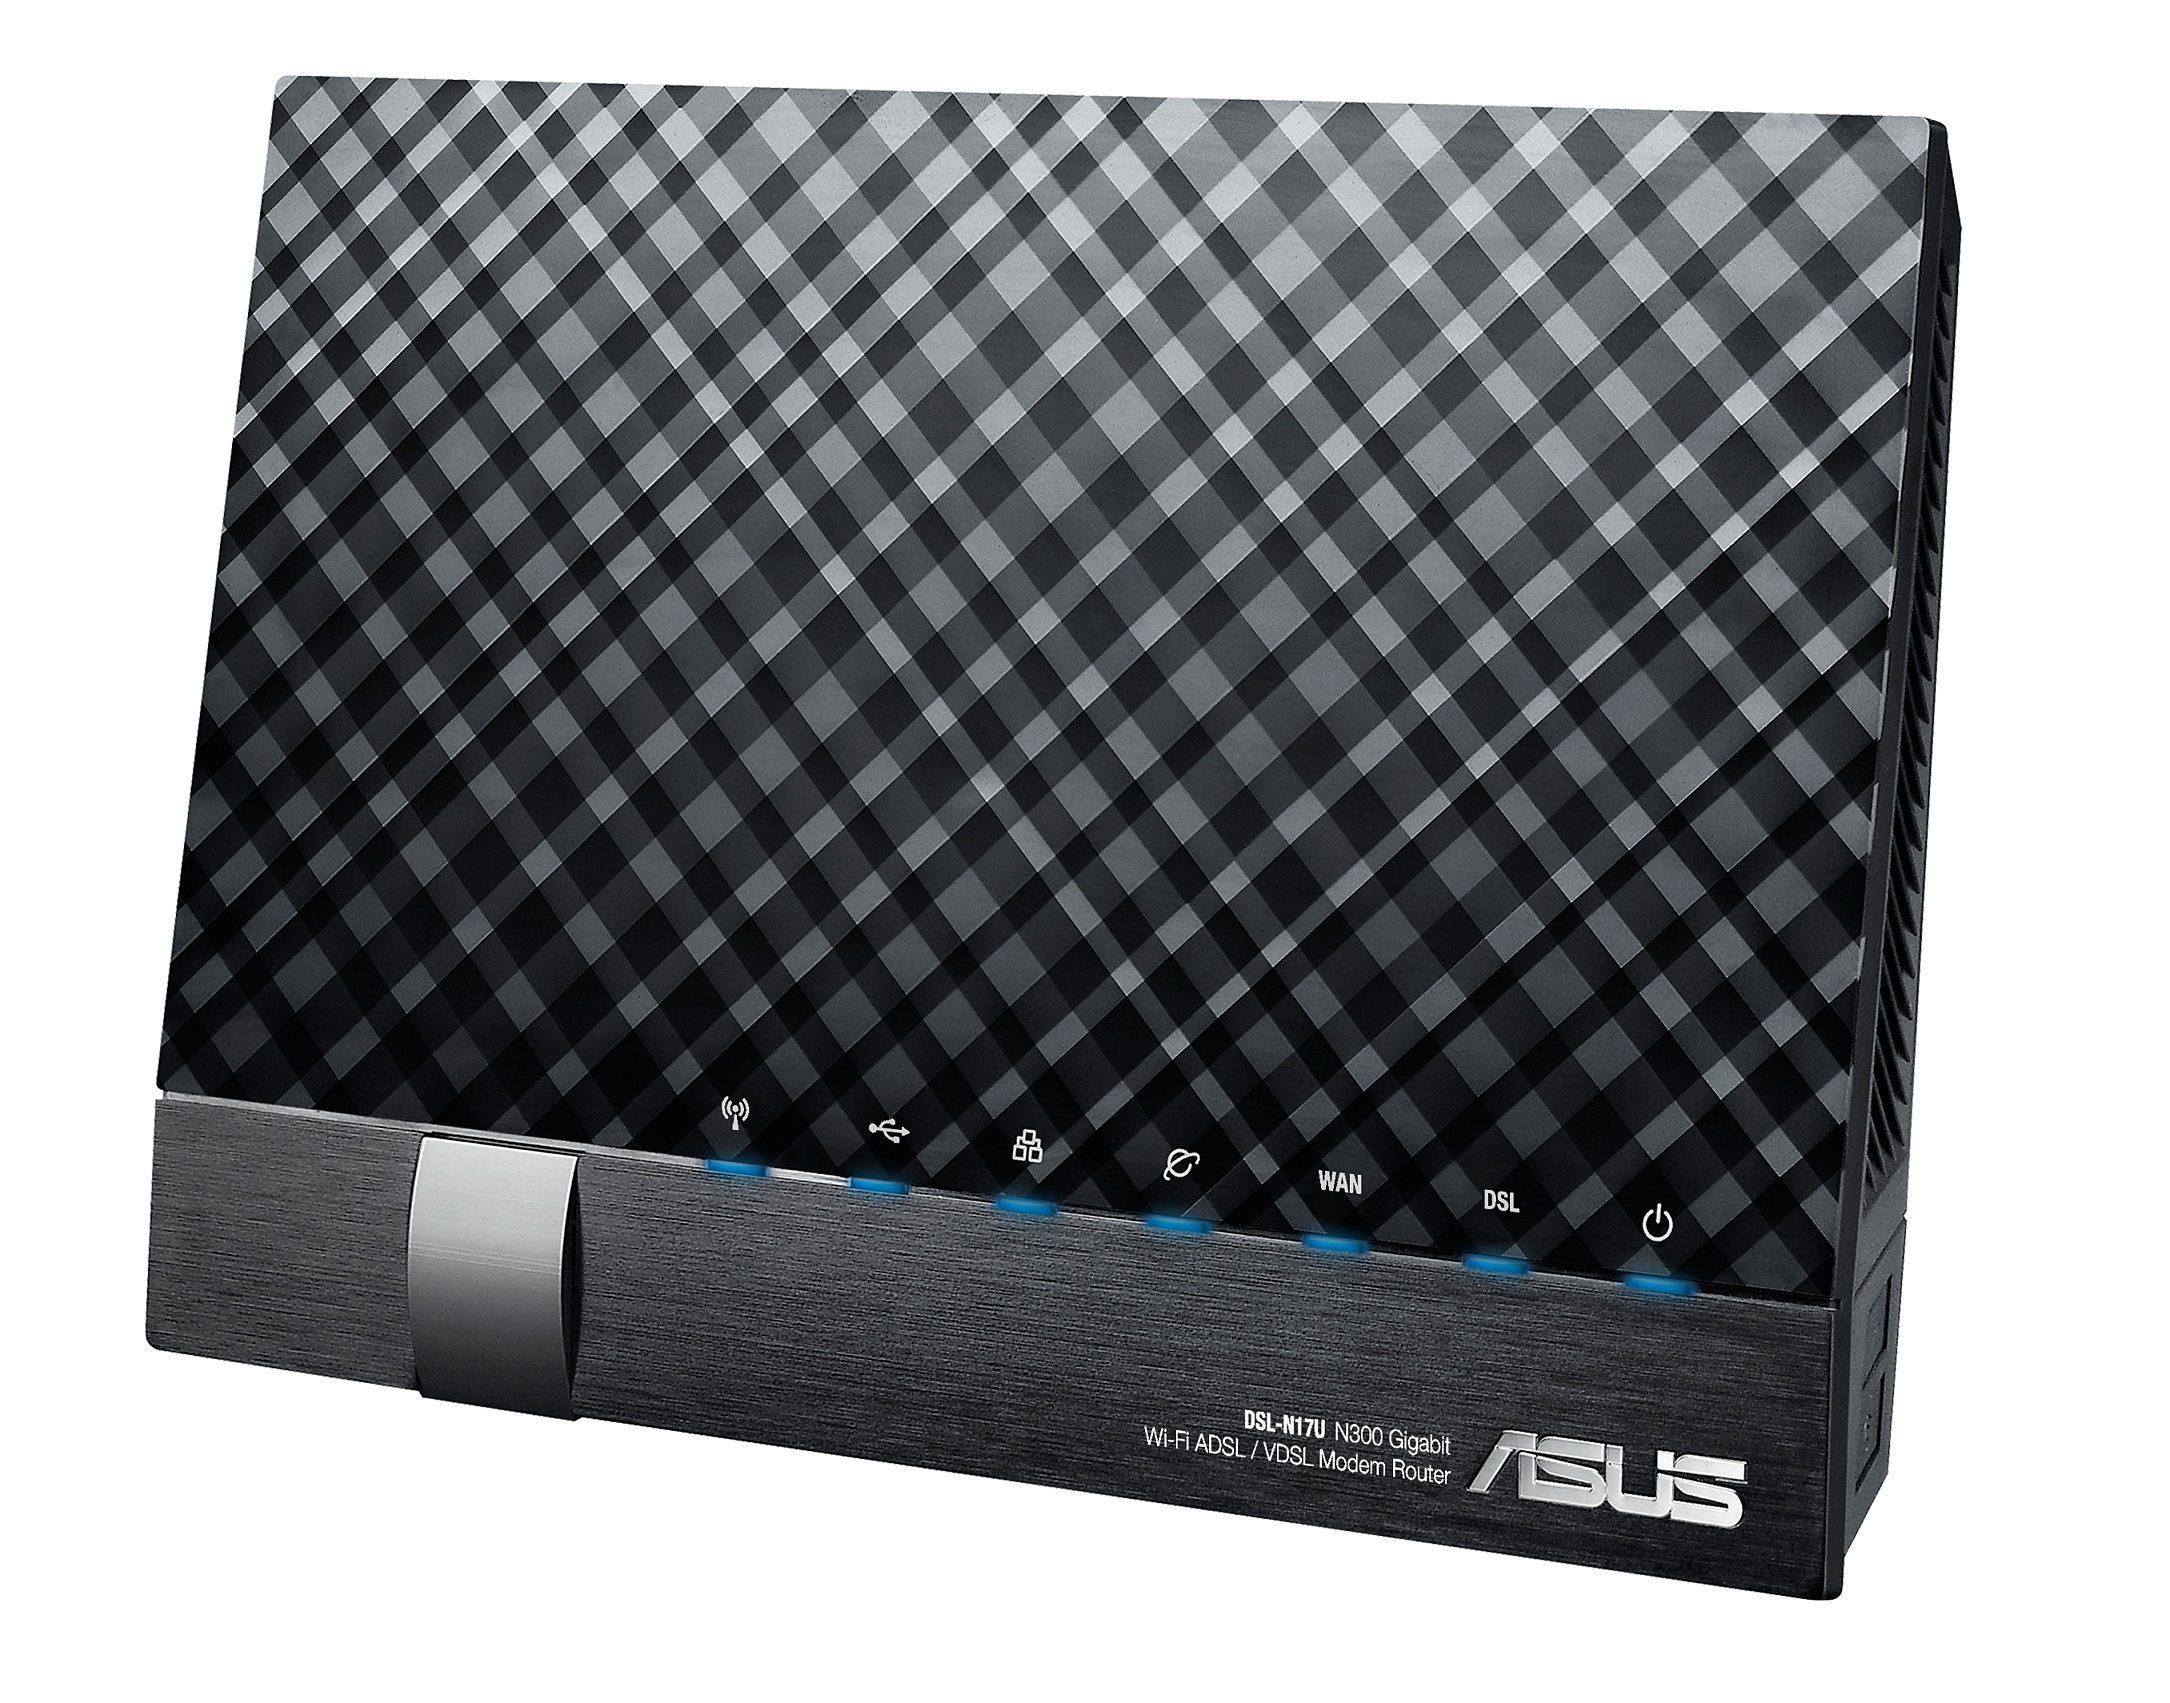 ASUS ASUS DSL-N17U N300 VDSL WLAN Modemrouter